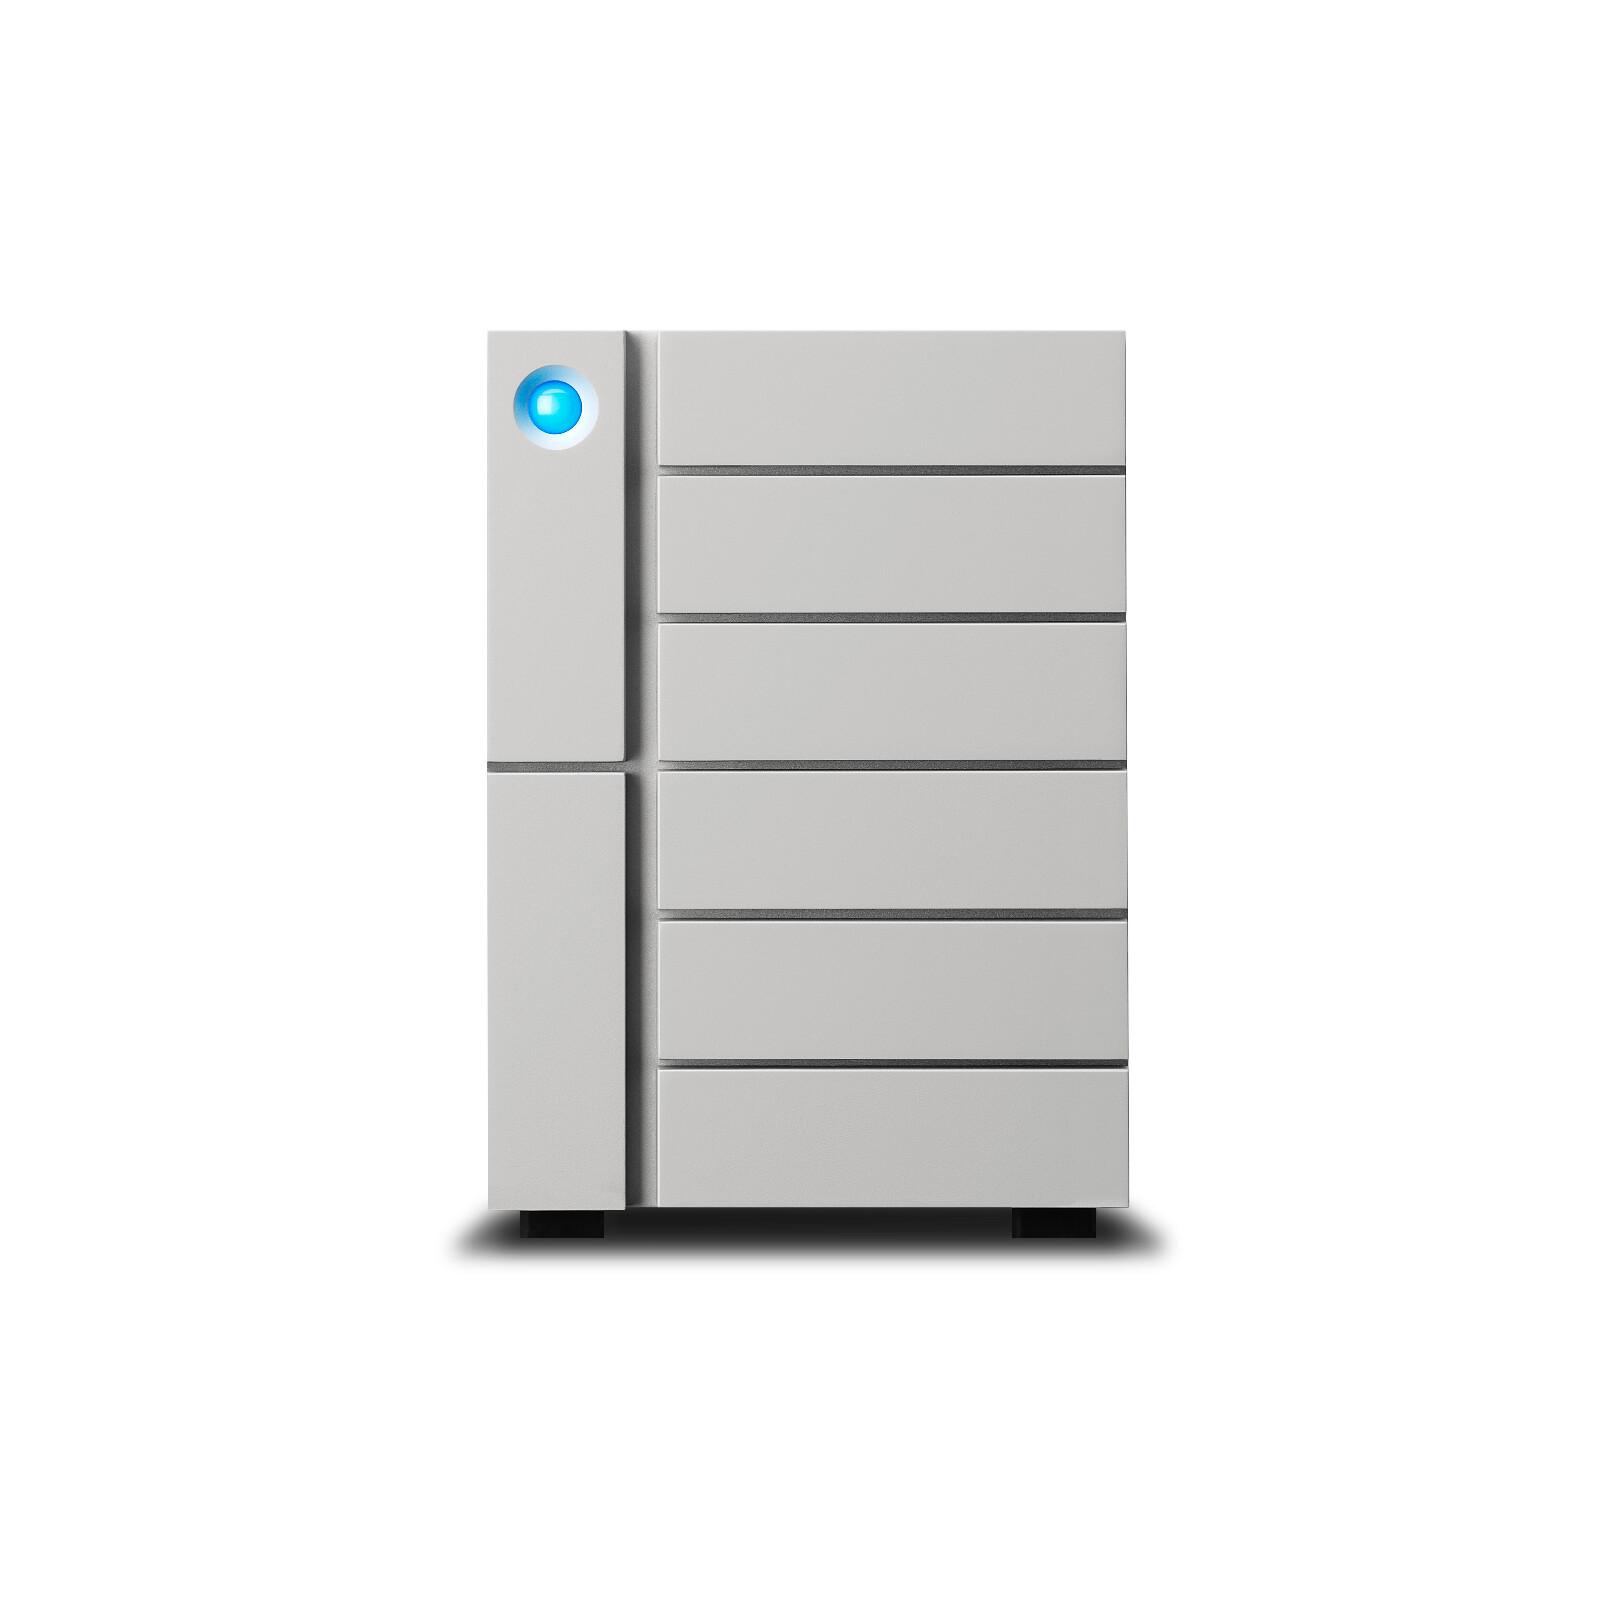 LaCie 6big 48TB Thunderbolt 3 Desktop RAID Storage